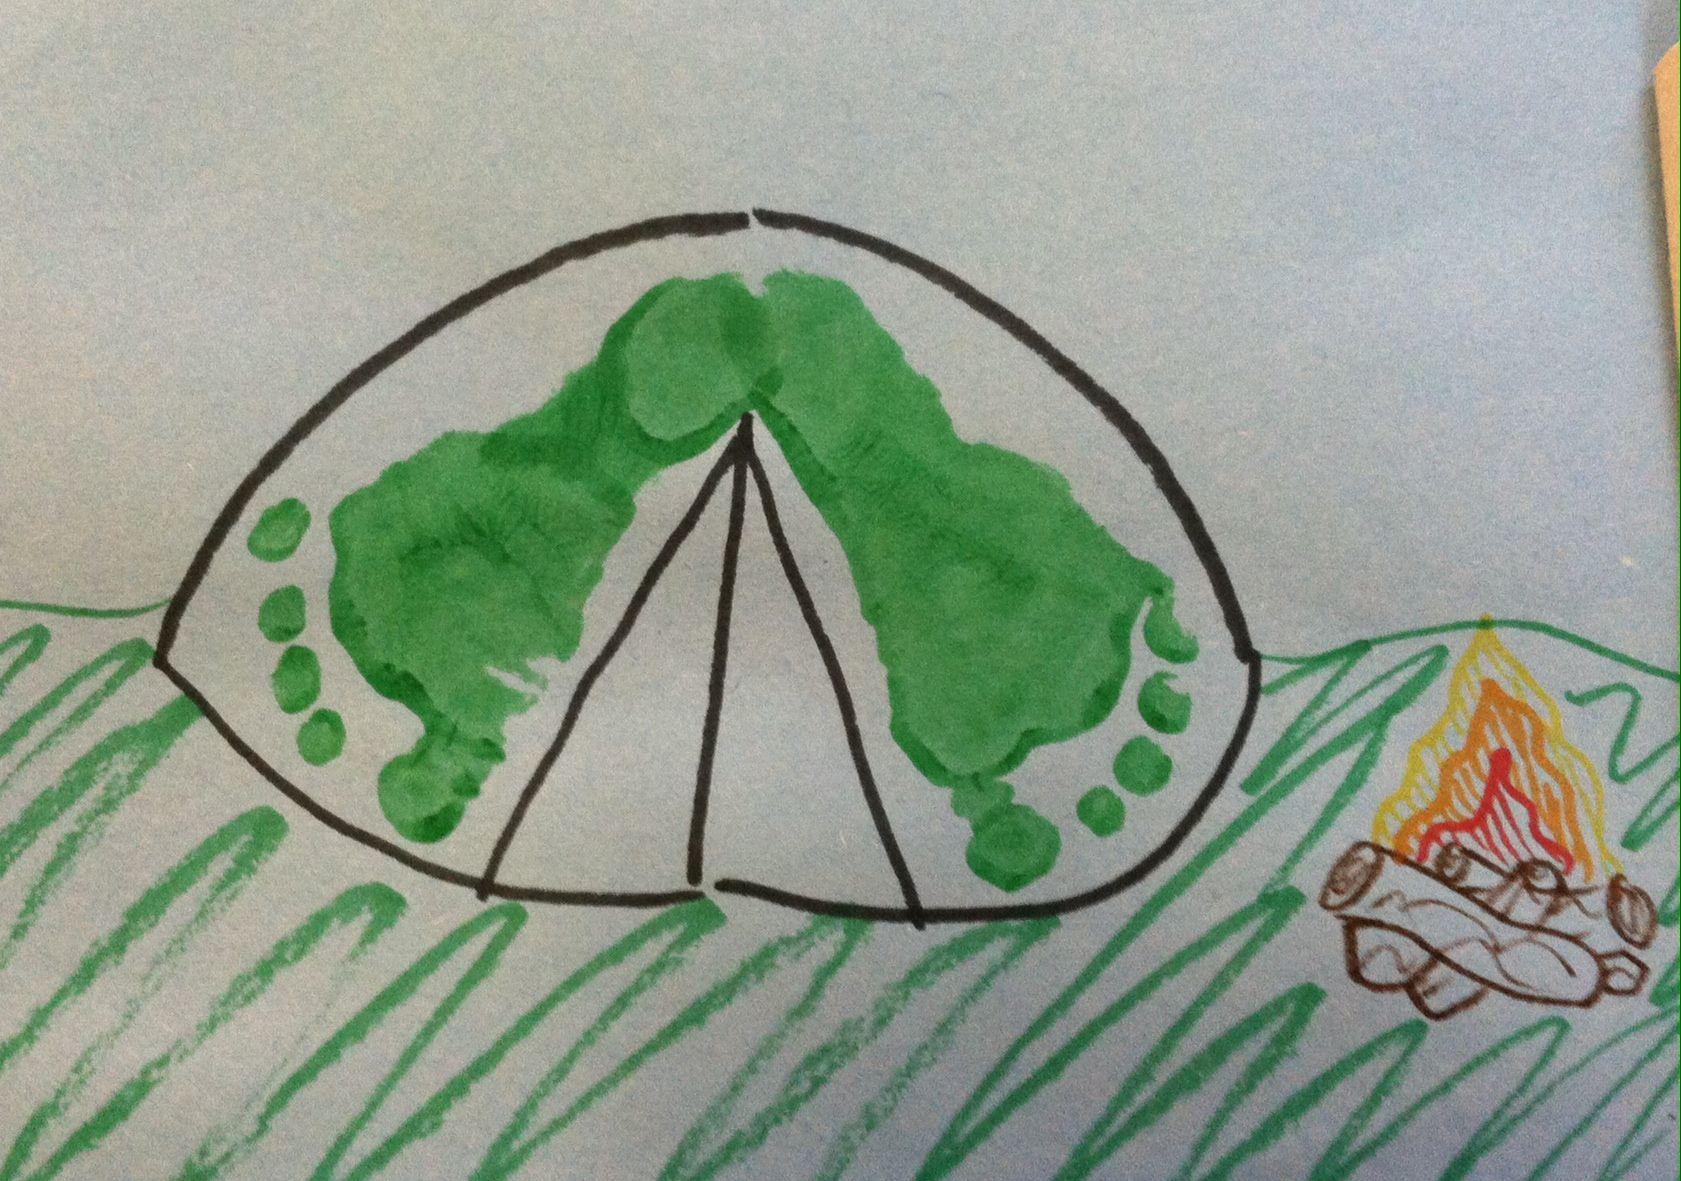 Foot-Print Camping Tent | Footprint and Handprint Art | Pinterest ...